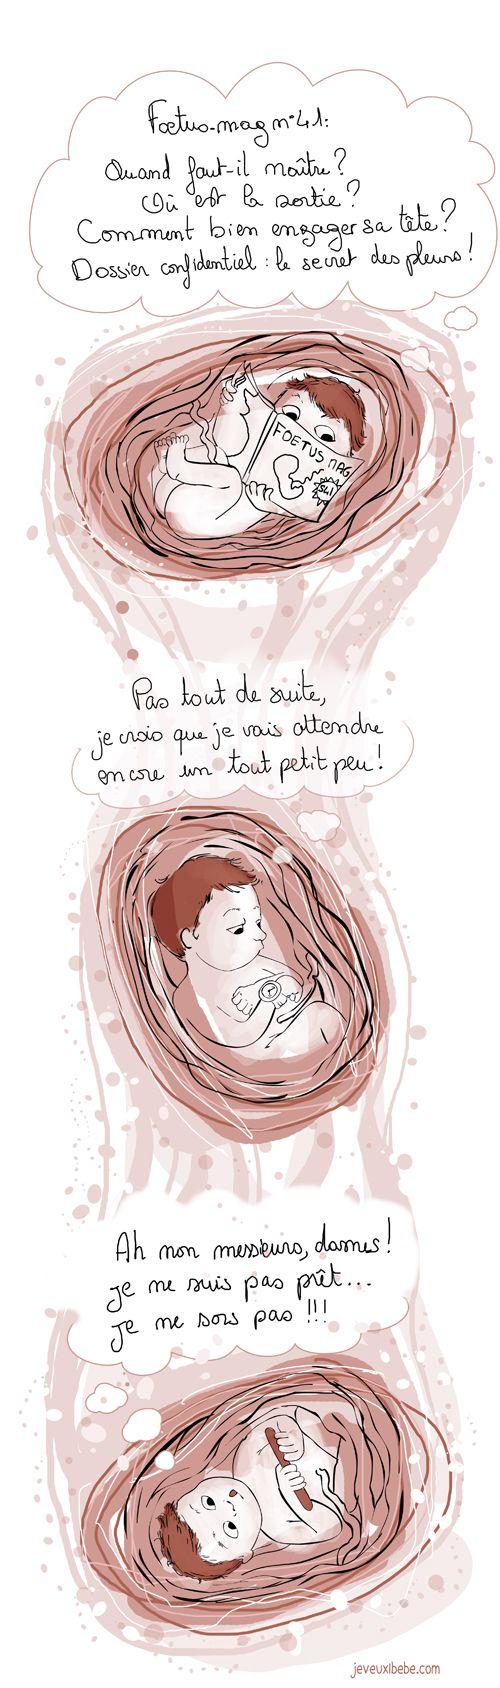 la vie in utero